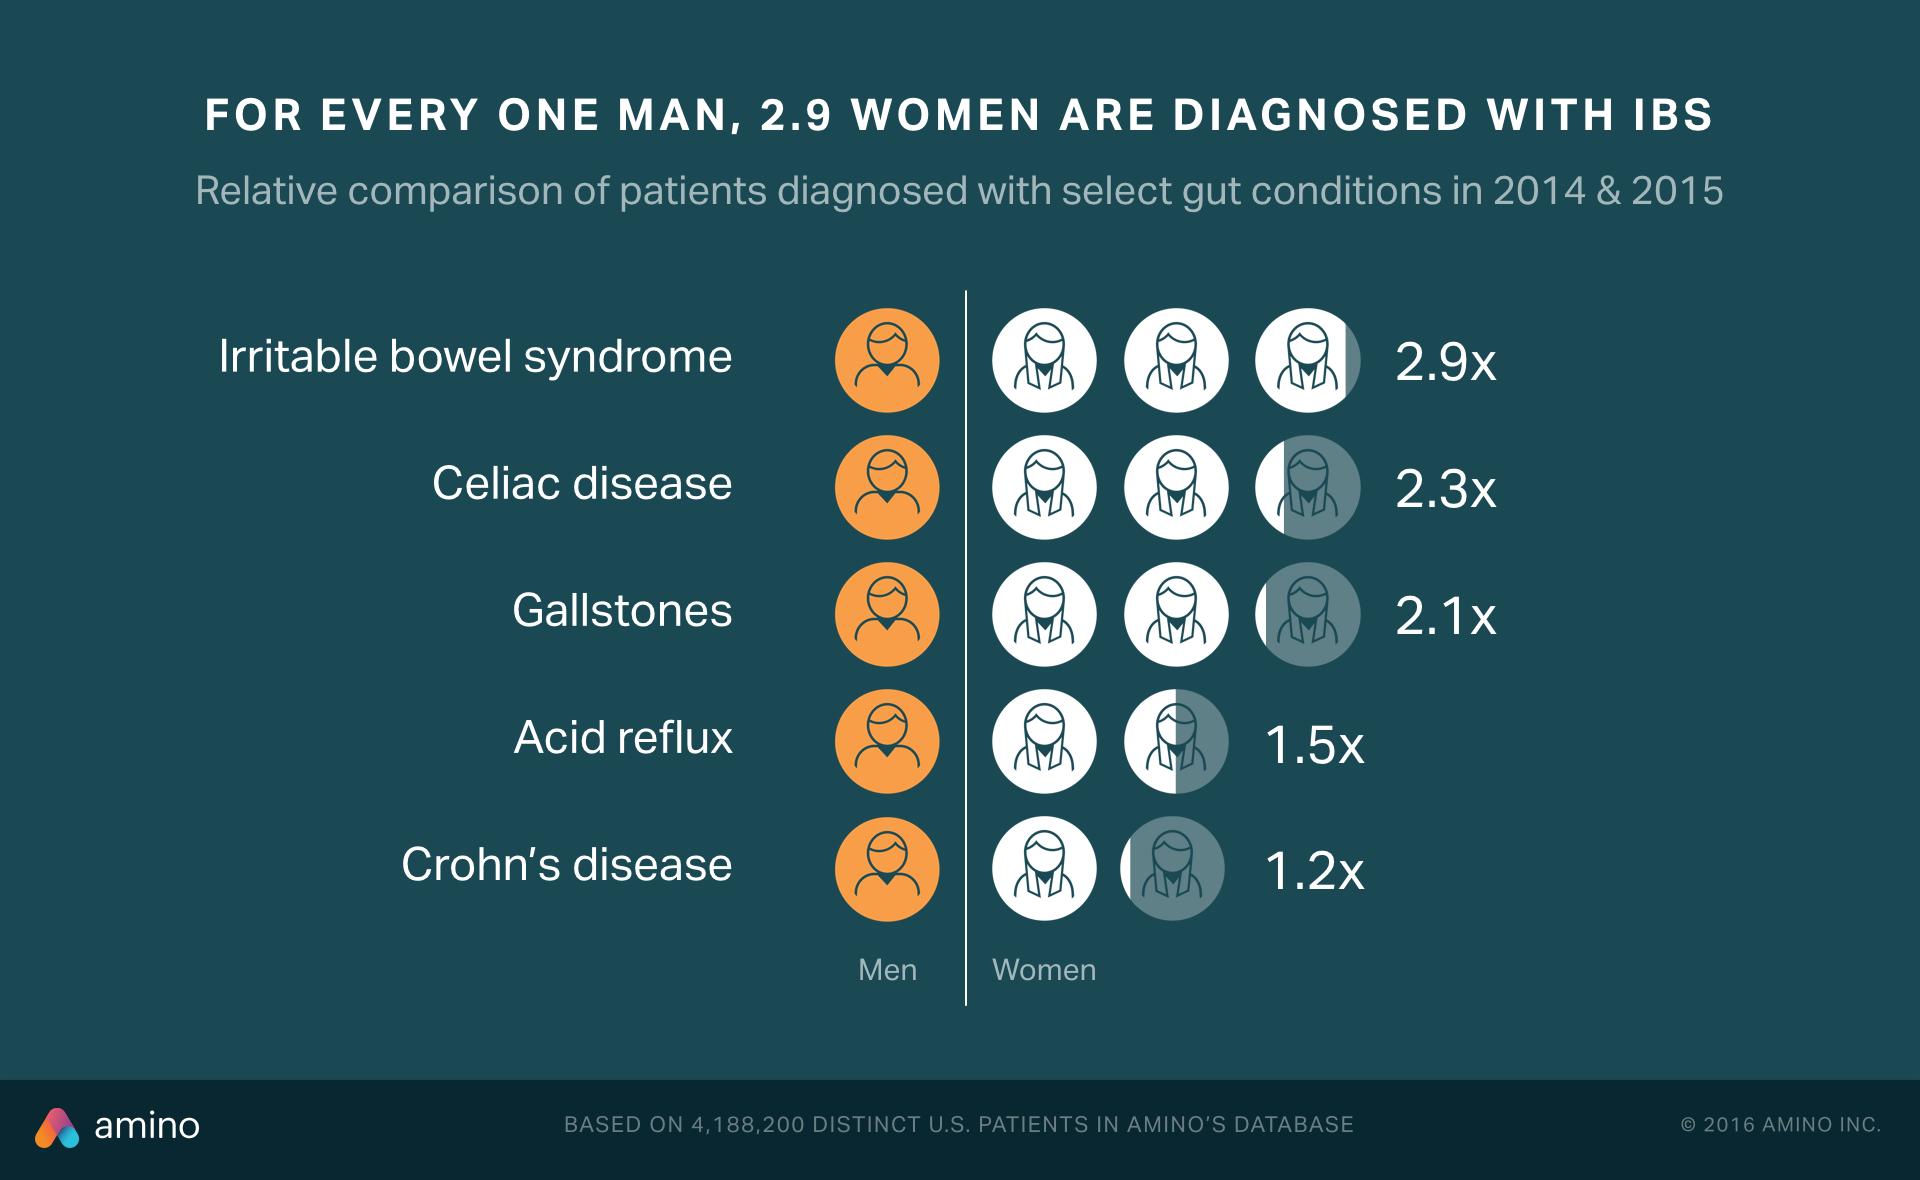 Women get IBS more than men